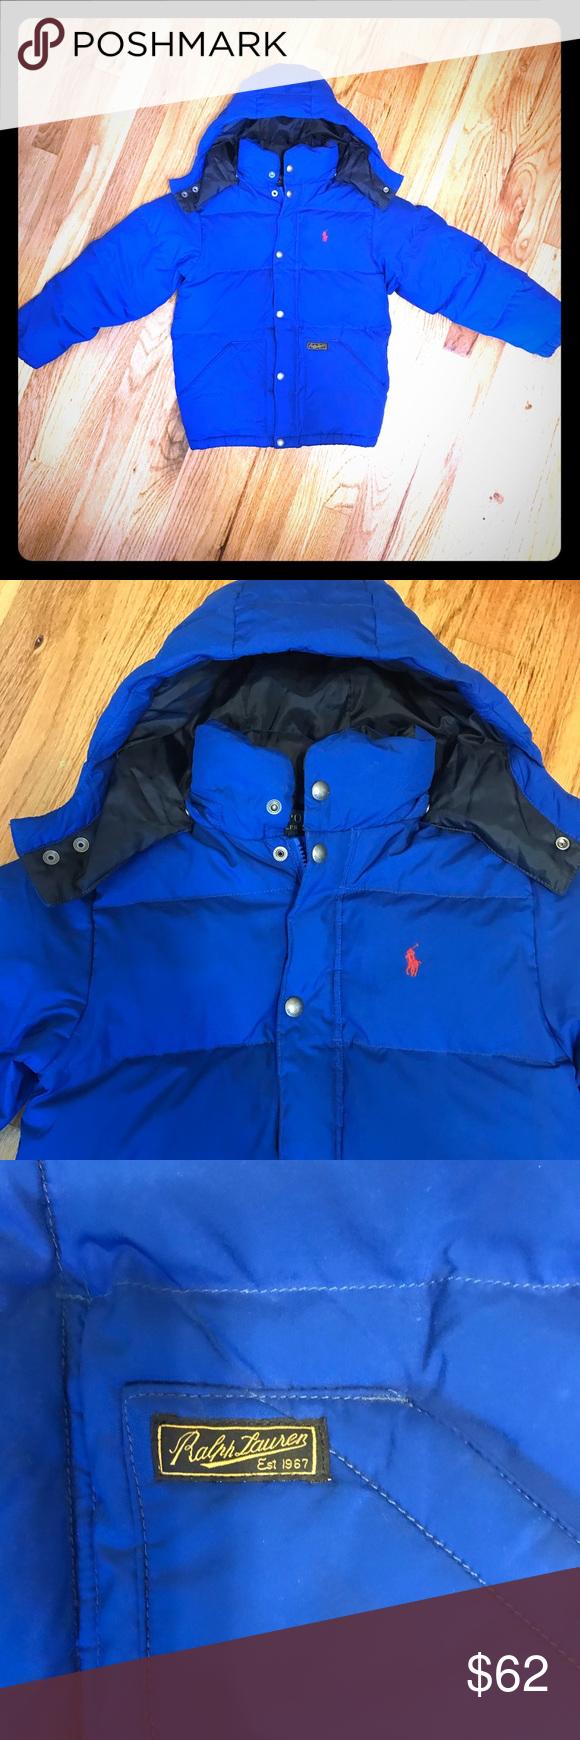 Polo Ralph Lauren Down Jacket W Removable Hood Down Jacket Polo Ralph Lauren Jackets [ 1740 x 580 Pixel ]